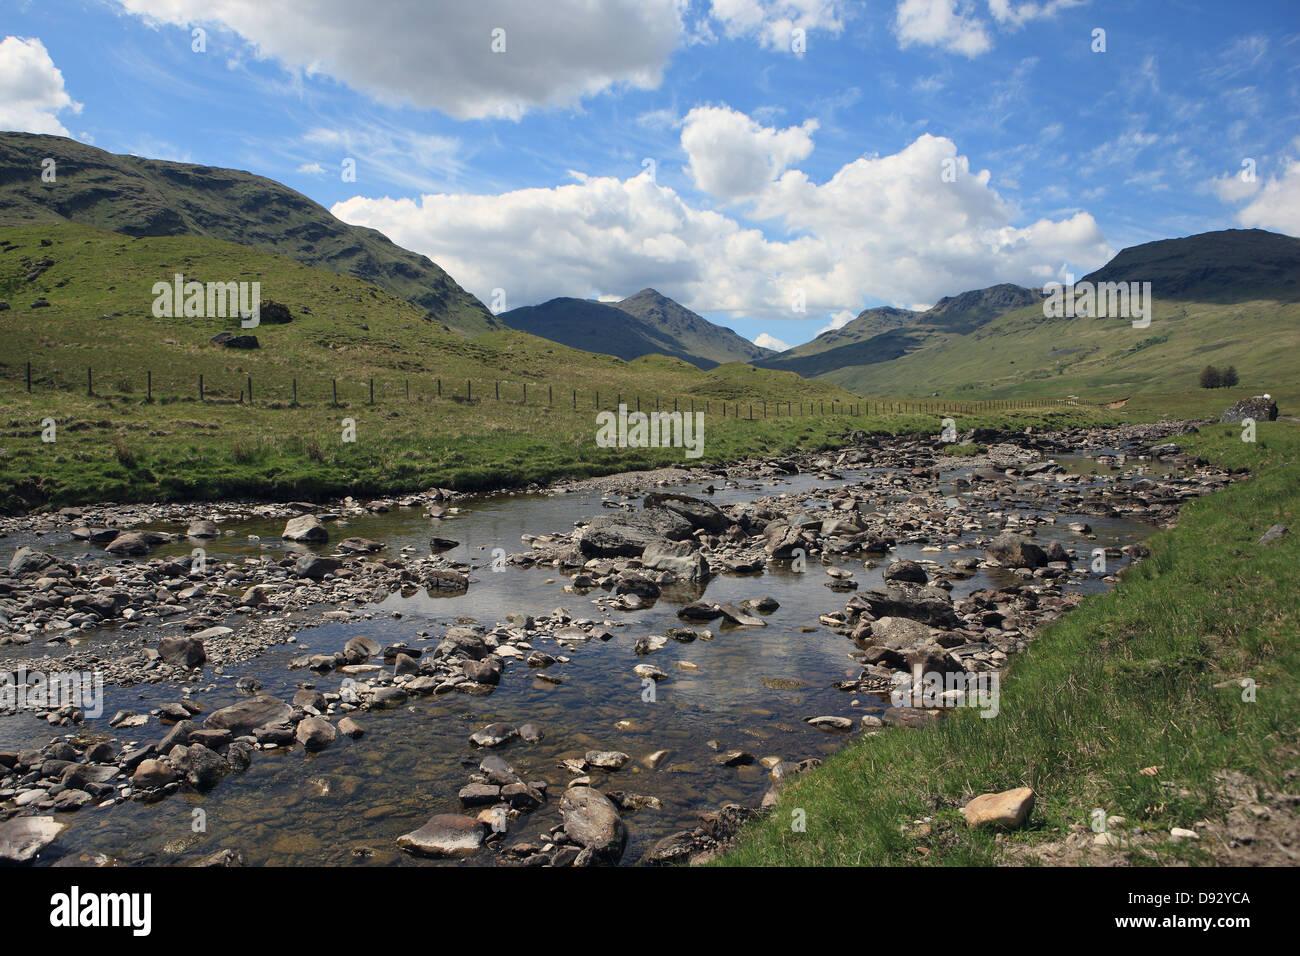 river-lochay-running-through-glen-lochay